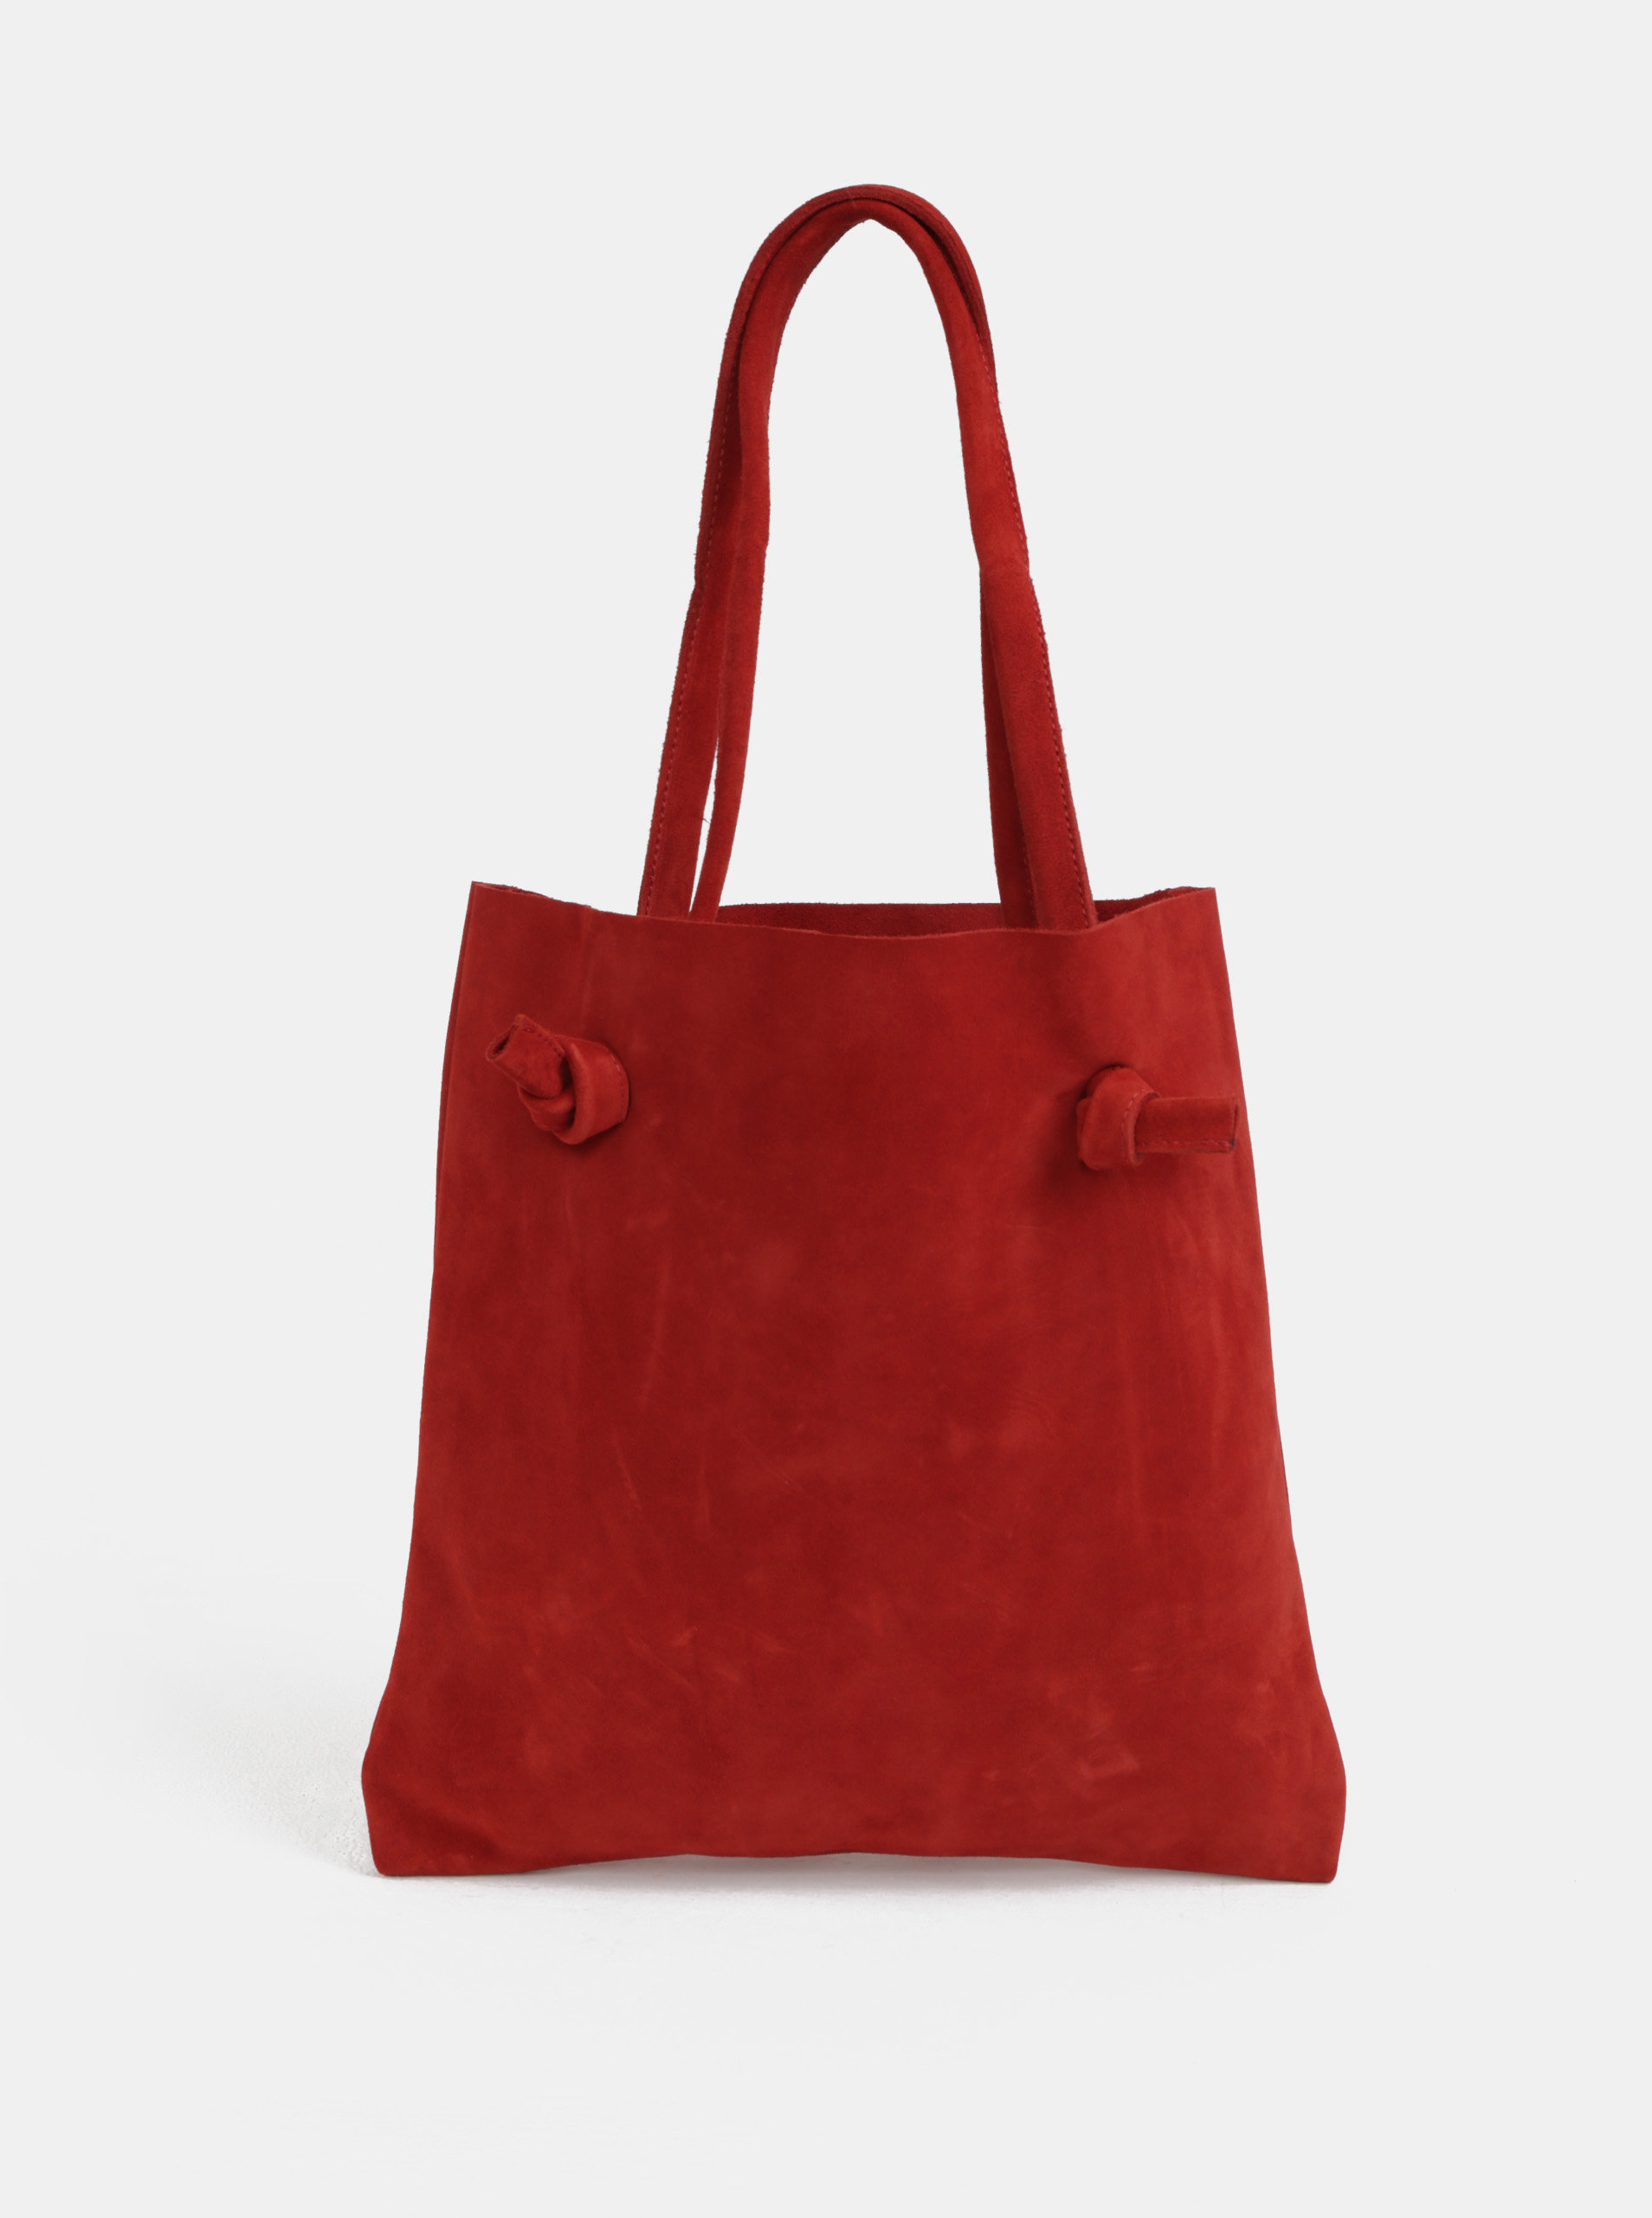 cfaf69a82f Červená kožená taška přes rameno s uzly WOOX Tegula Simplex Purpurea